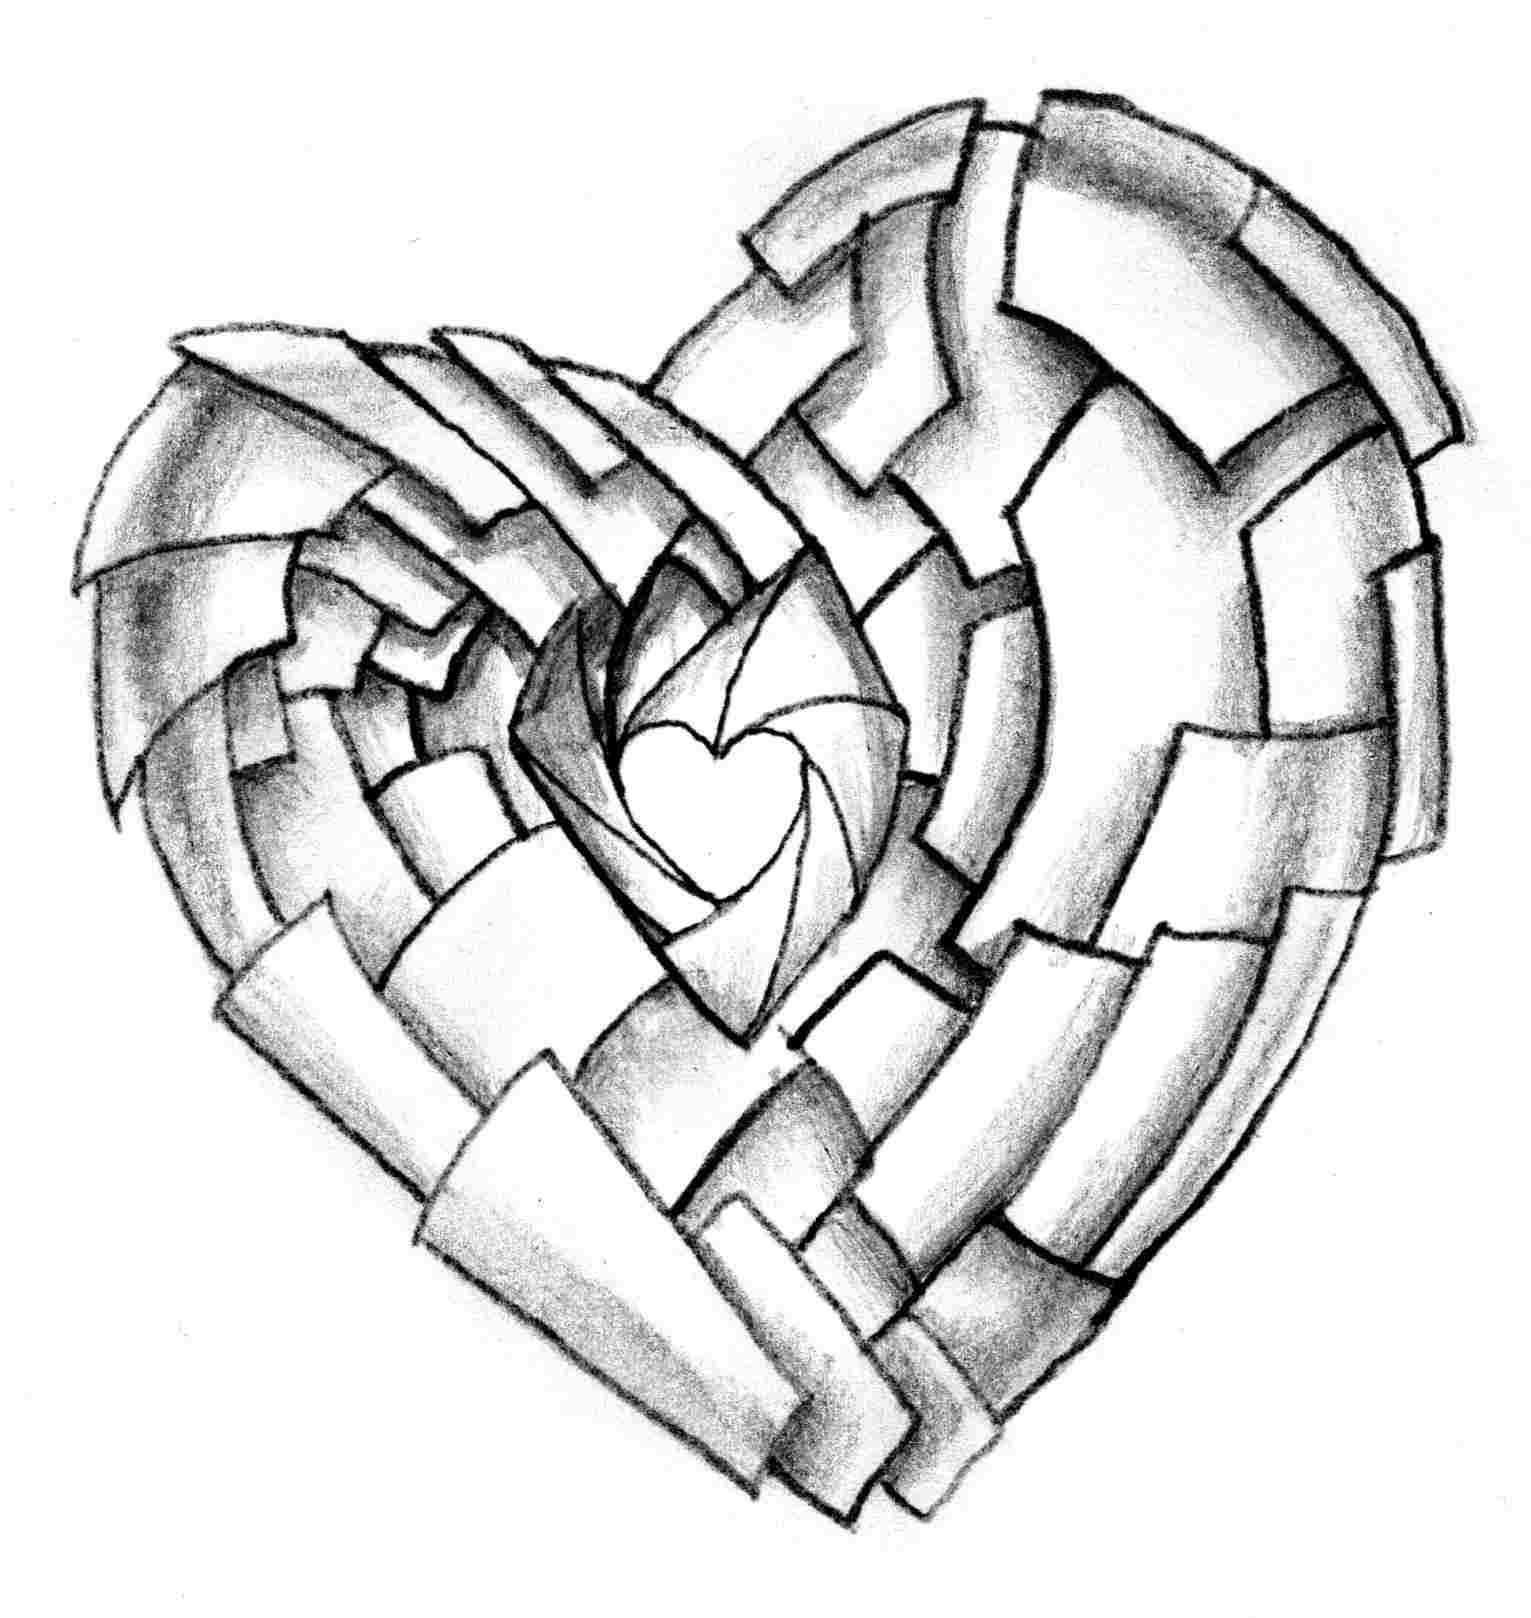 Broken heart drawings in pencil free download best broken heart